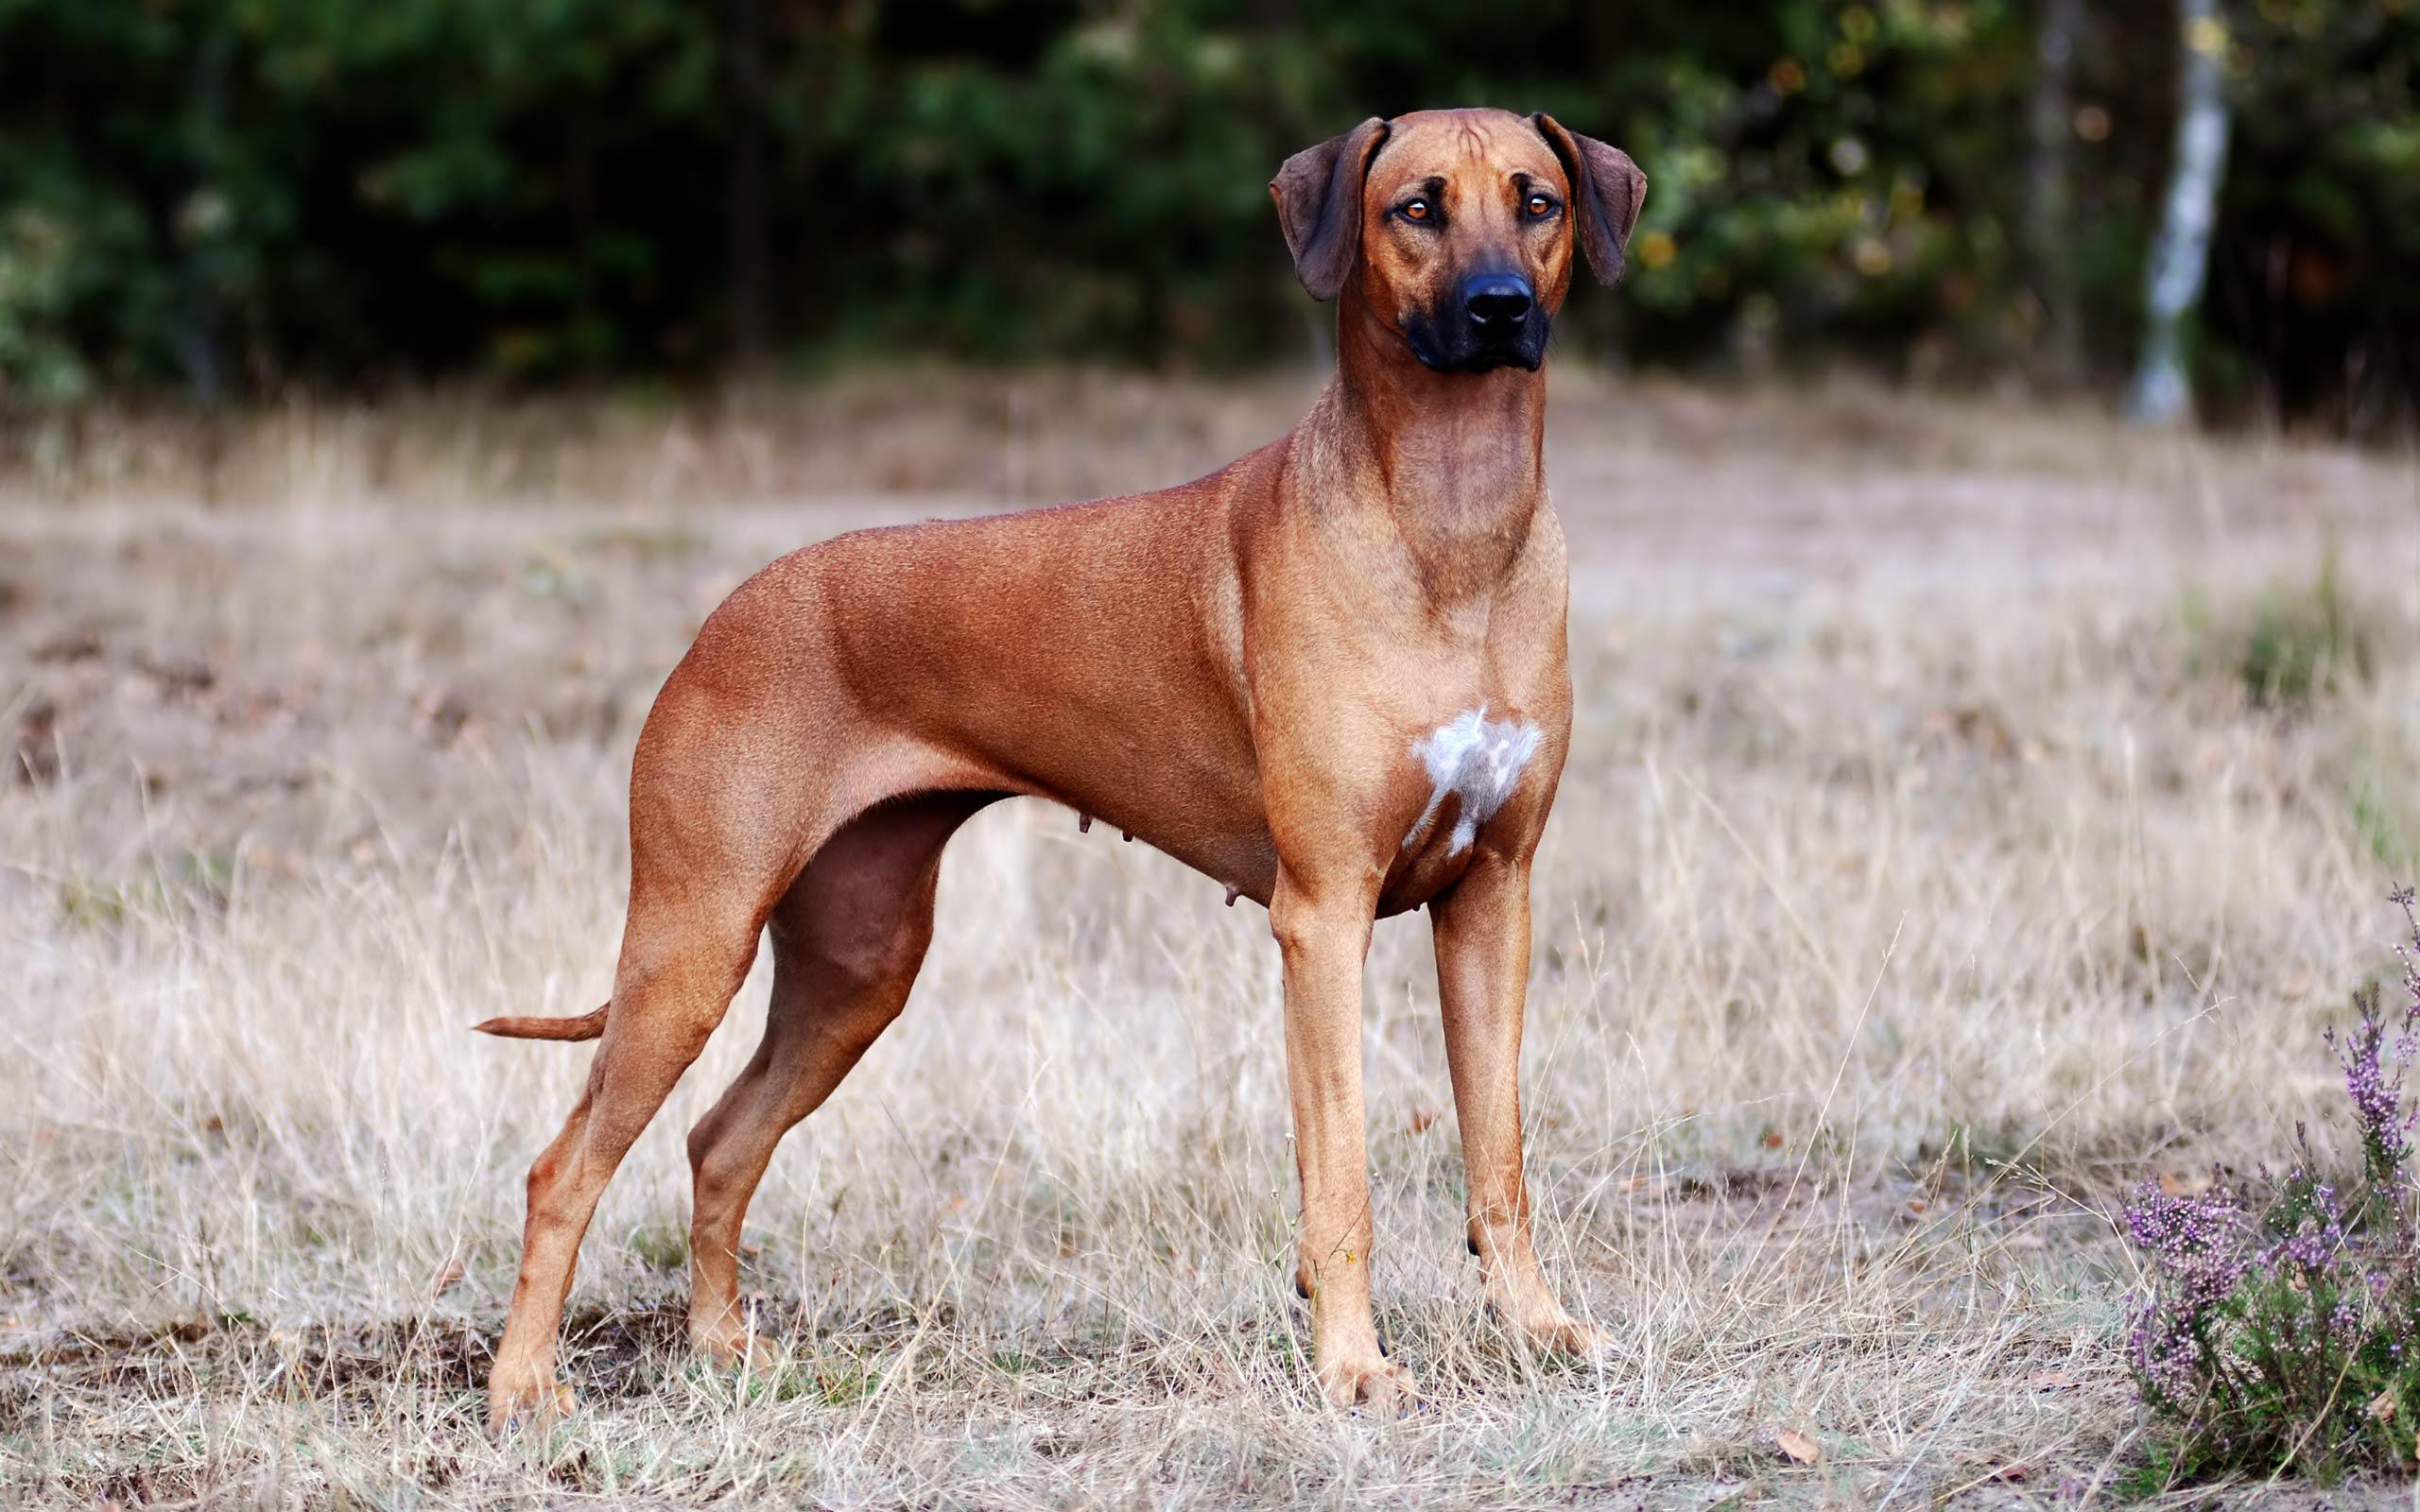 Best 41 Hound Dog Backgrounds on HipWallpaper Funny Dog 2560x1600